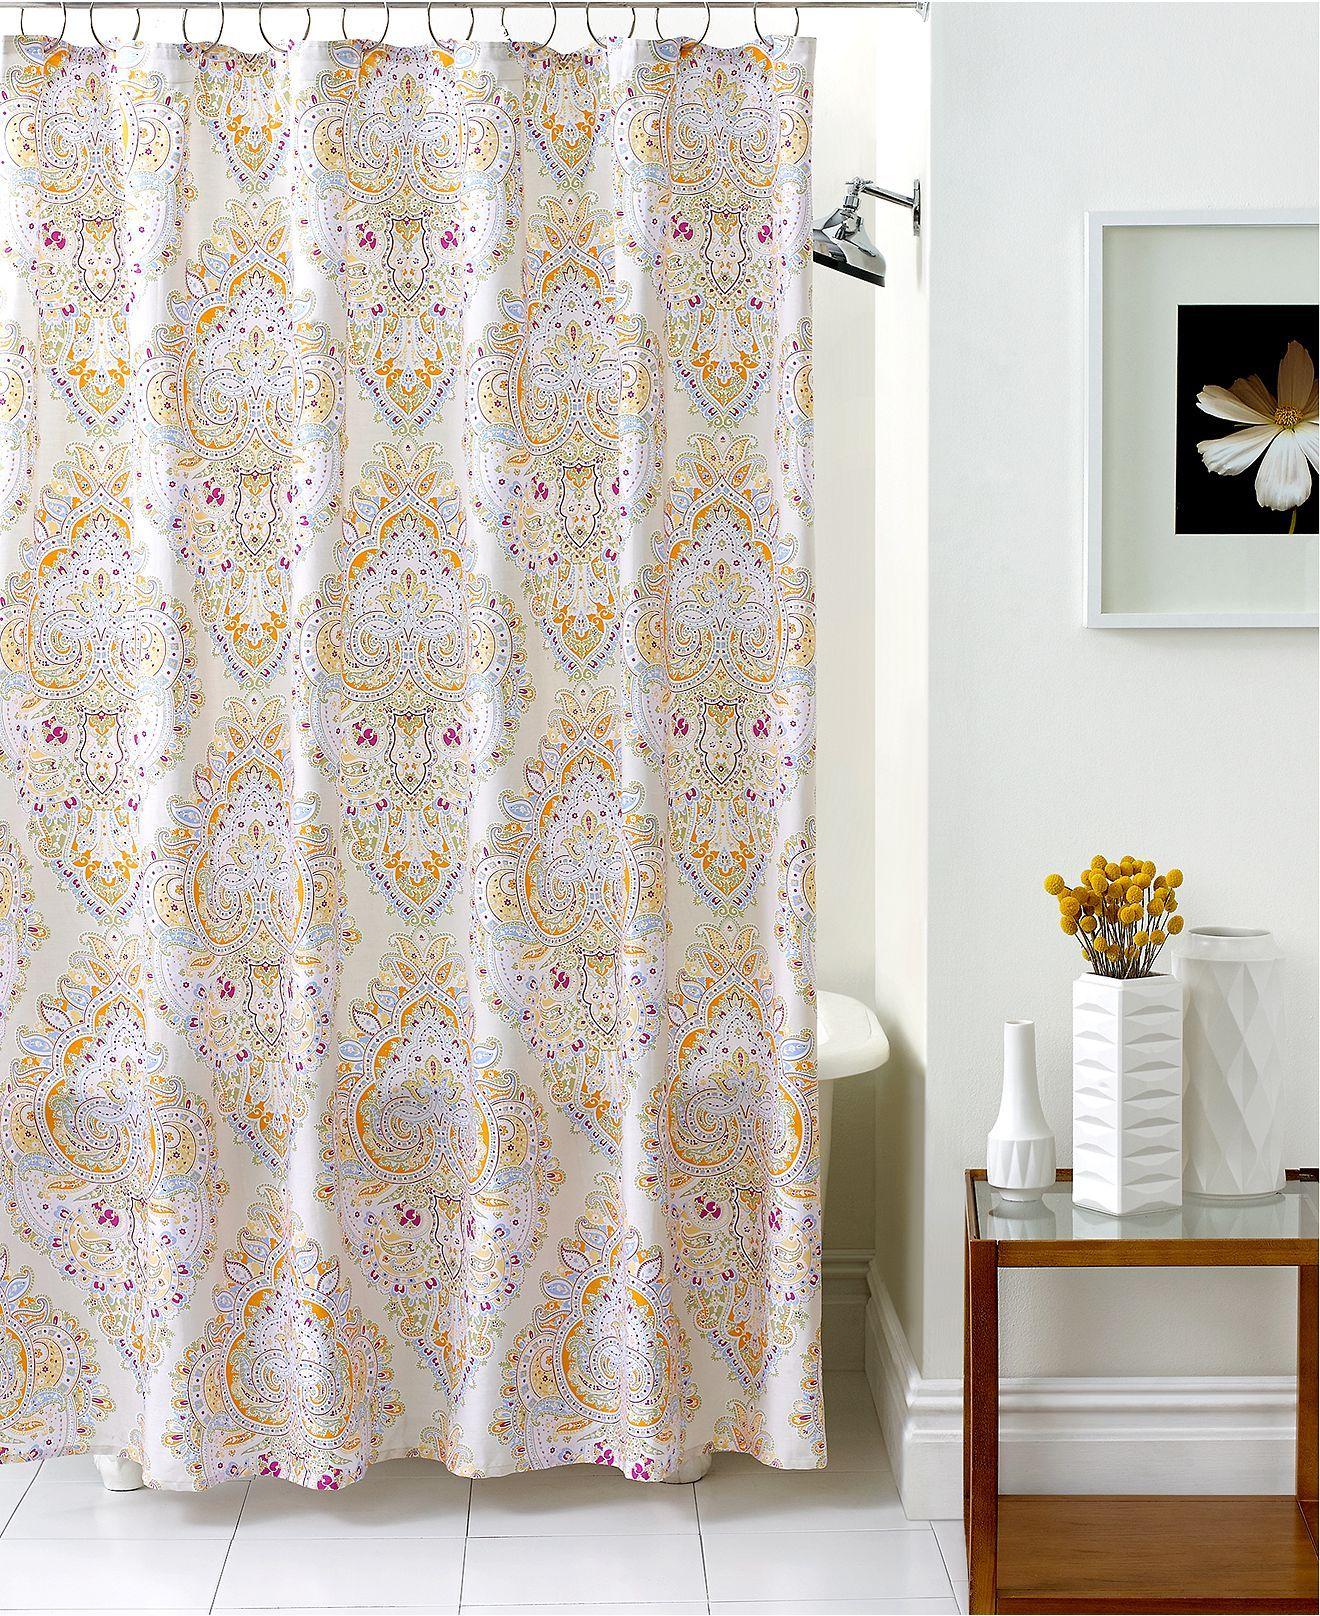 Echo Bath Accessories Laila Shower Curtain